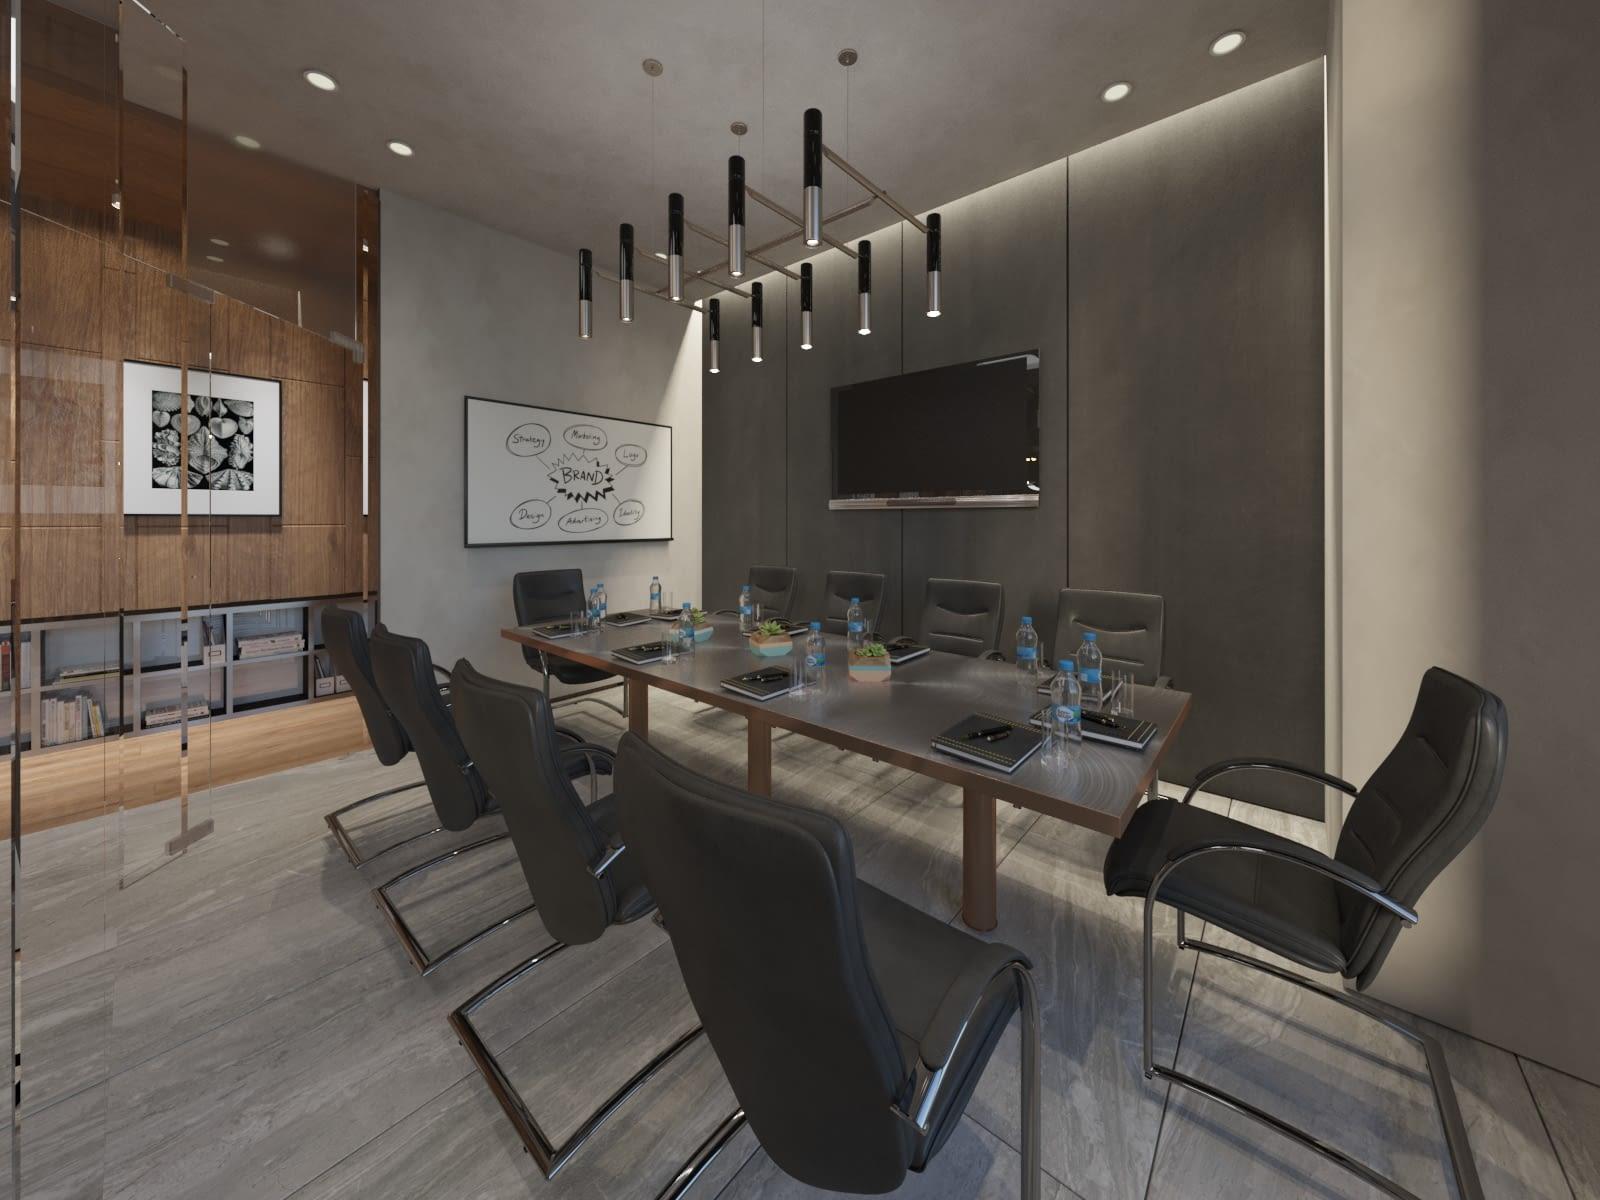 office1_Interactive LightMix_View04